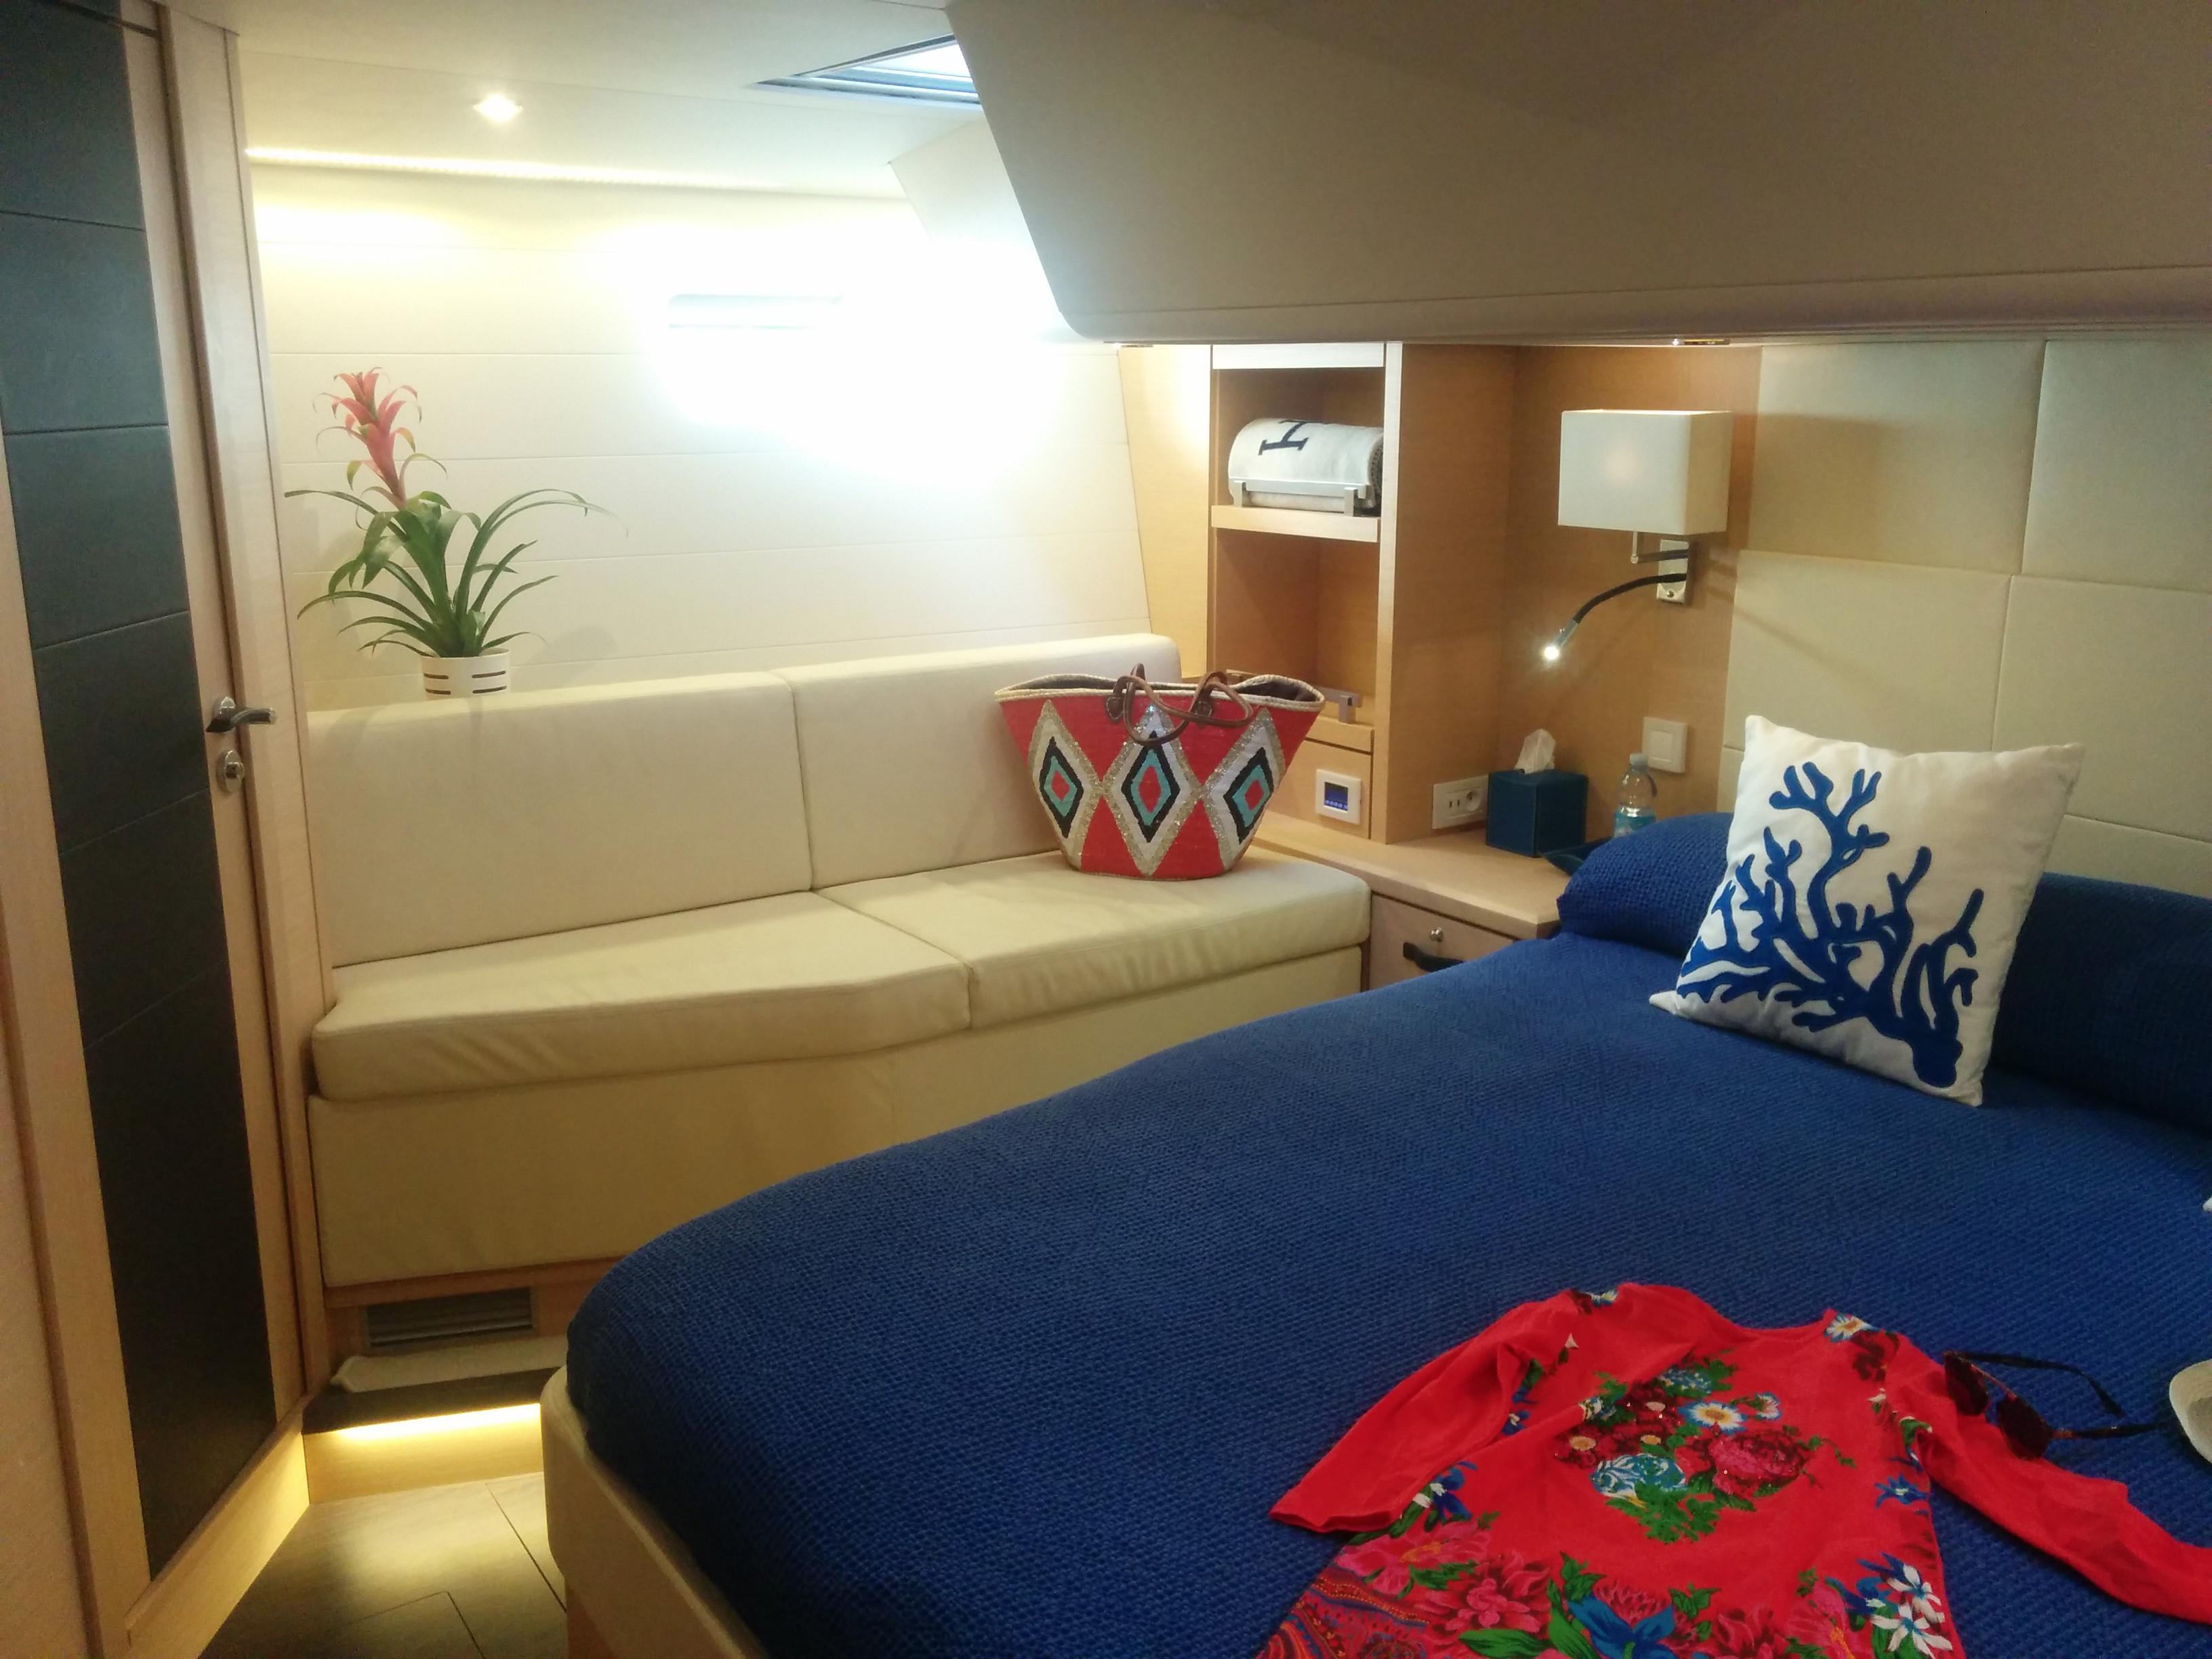 Amandine Jeanneau 2015 64 65 Yacht For Sale In Spain